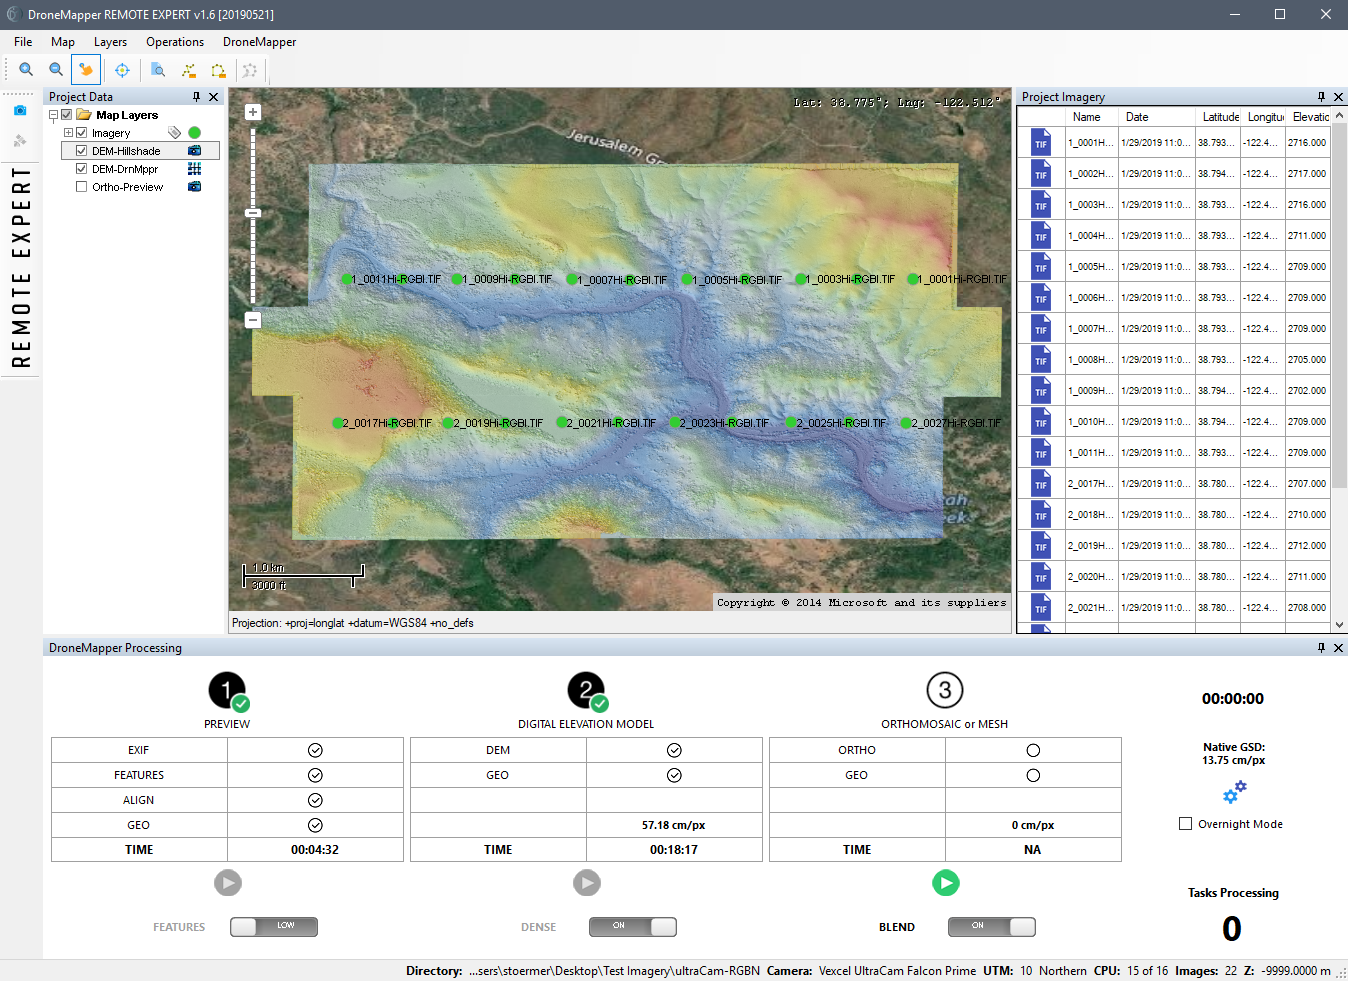 drone-mapper-remote-expert